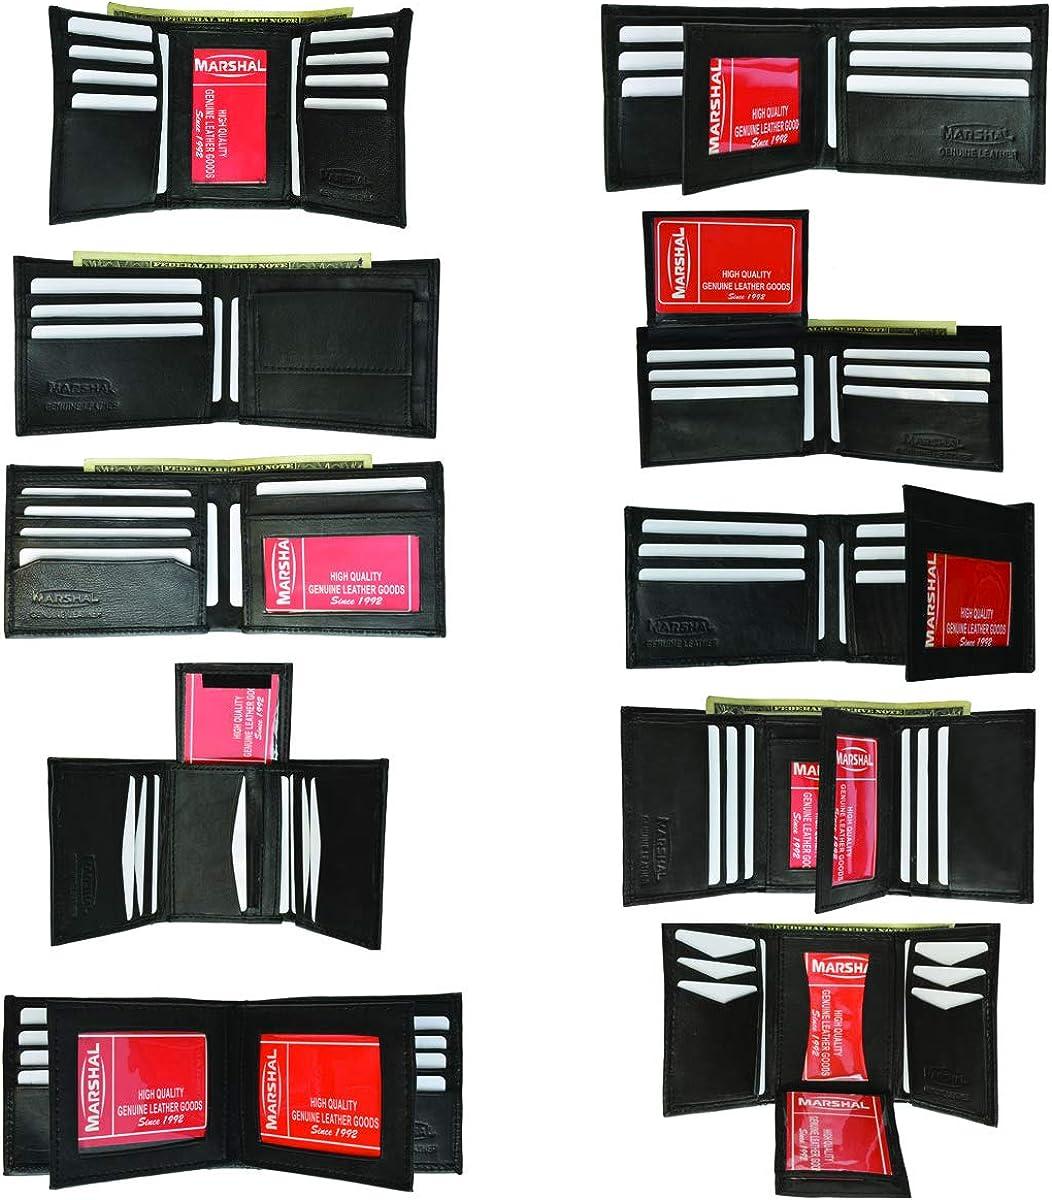 Wholesale Men's Lambskin Wallets Trifold & Bifold by Marshal